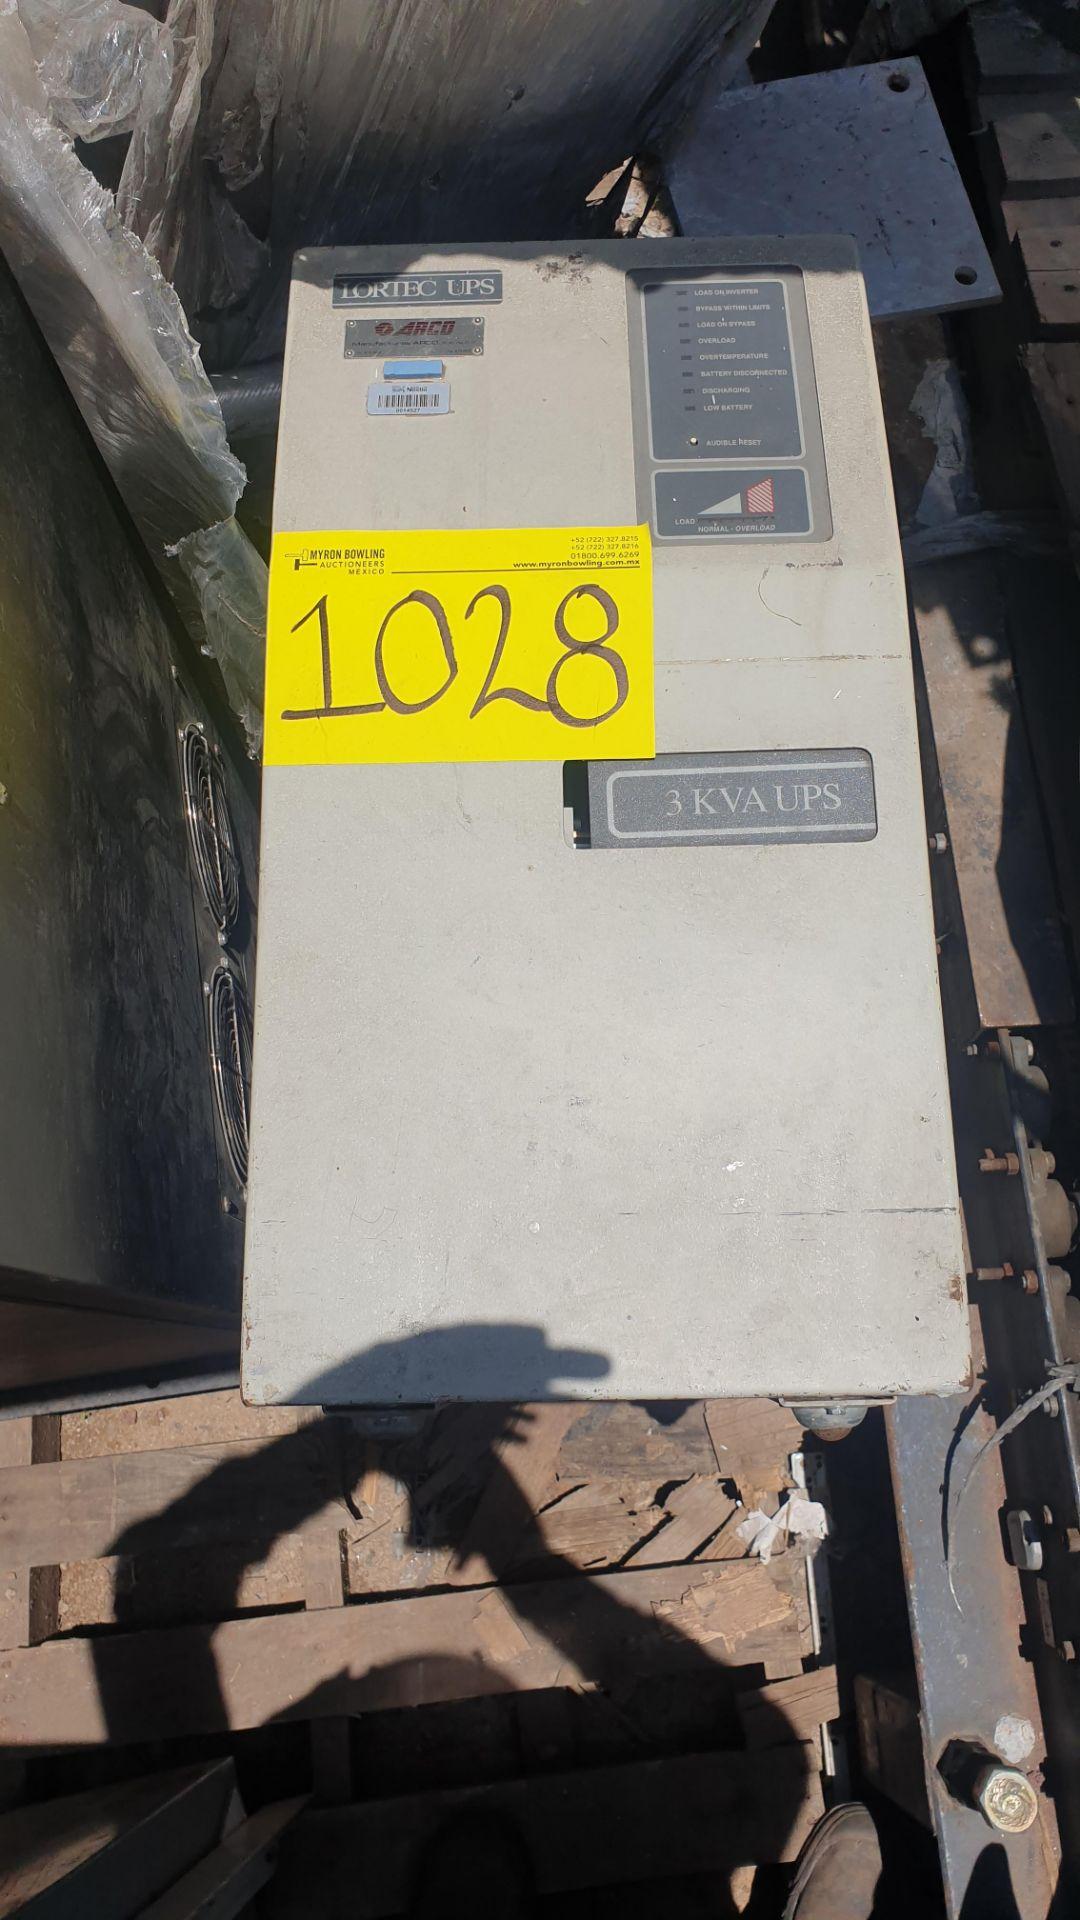 1 Ferrups Power bank system model FD10KVA 208-240V includes Lortec UPS of 3KVA - Image 2 of 11